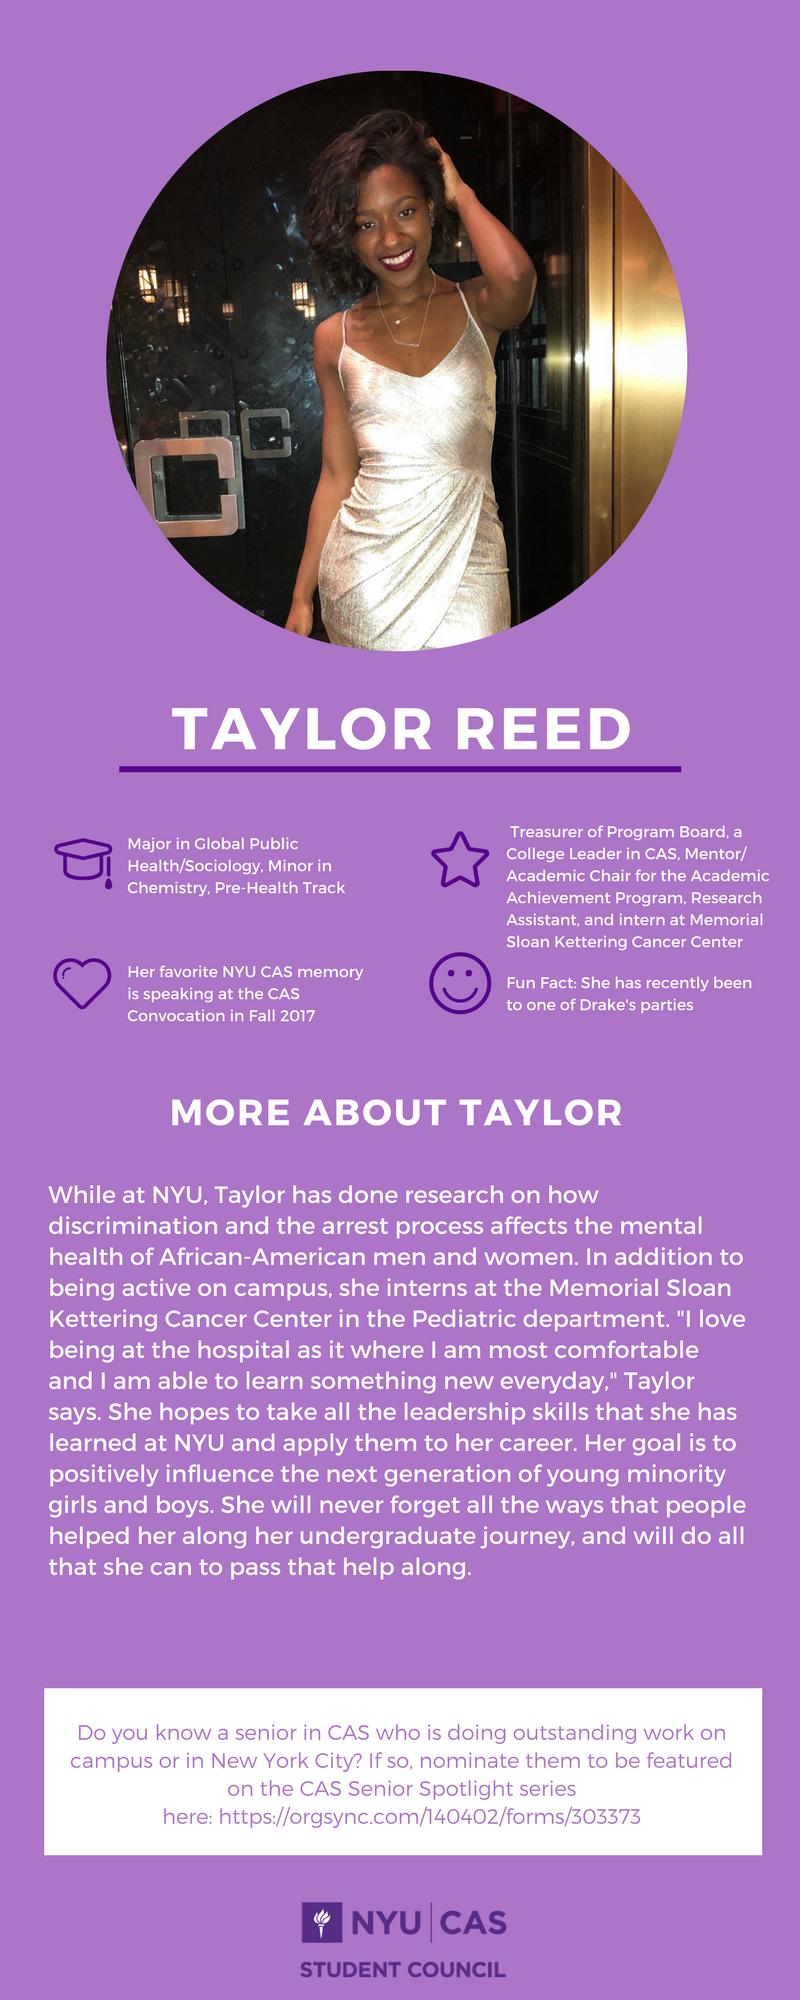 Taylor Reed